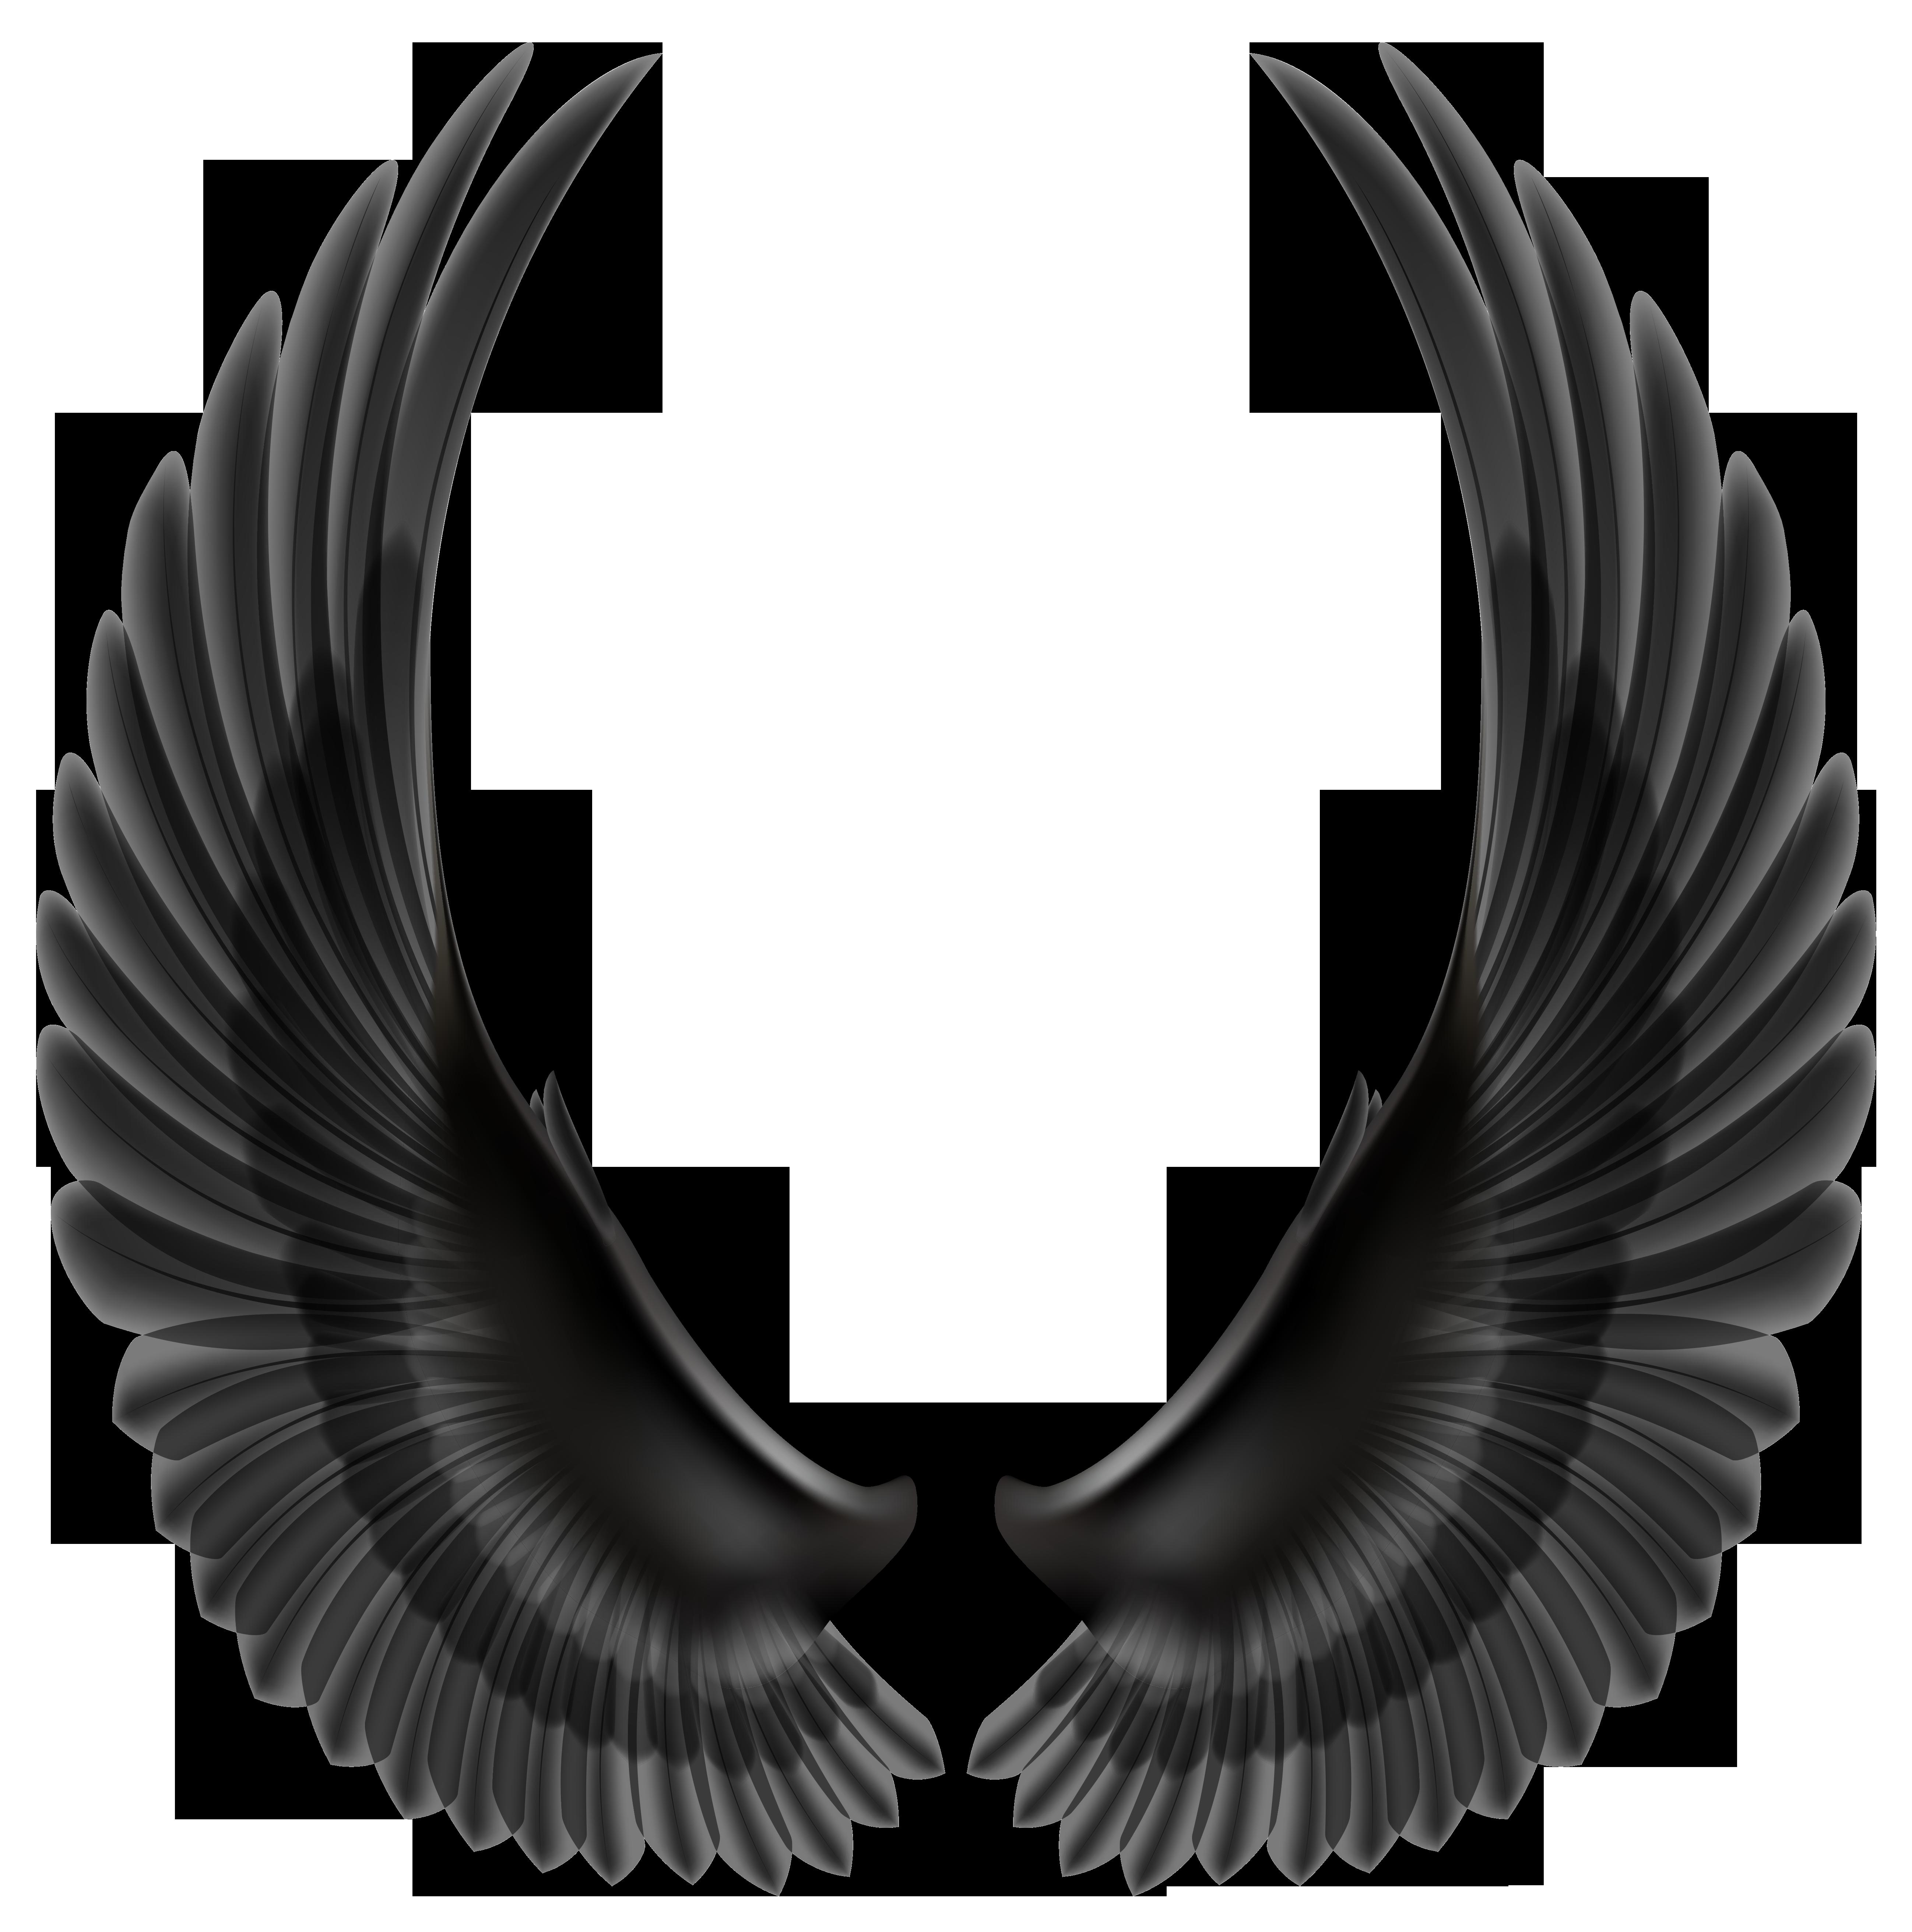 Black Wings PNG Clip Art Image.